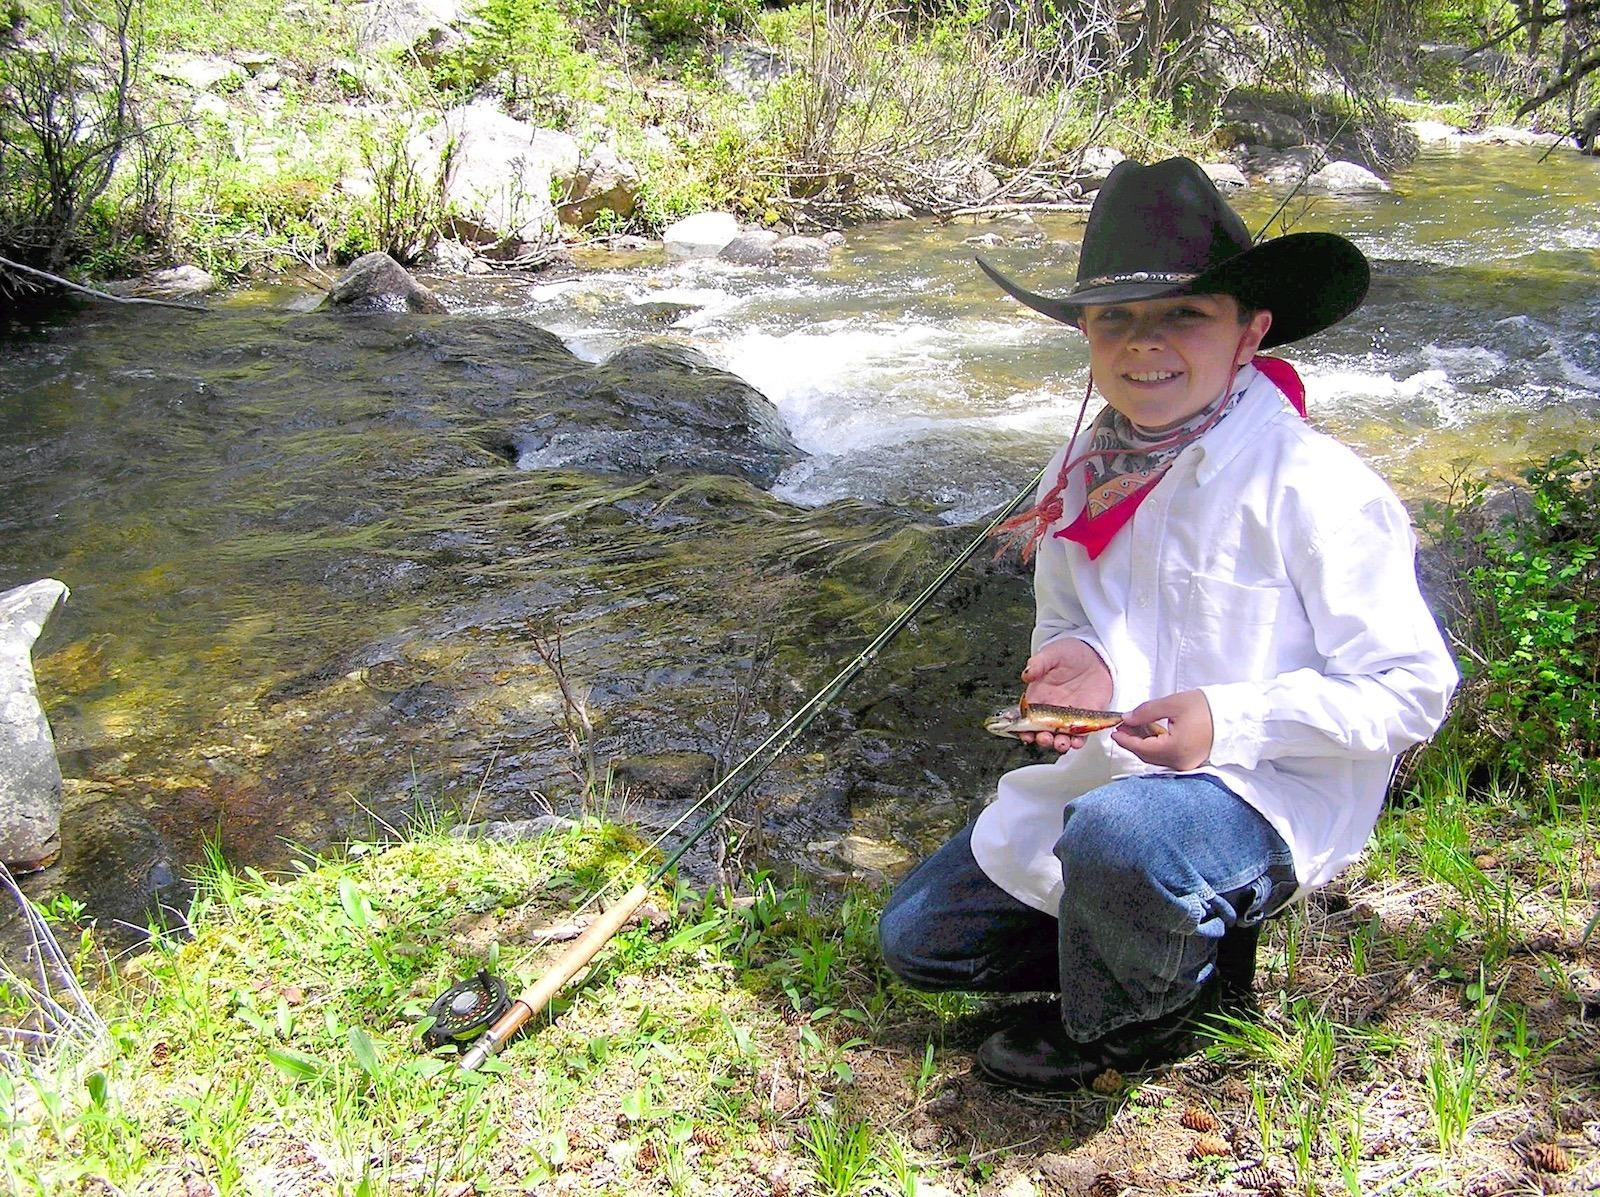 Fishing at Paradise Guest Ranch